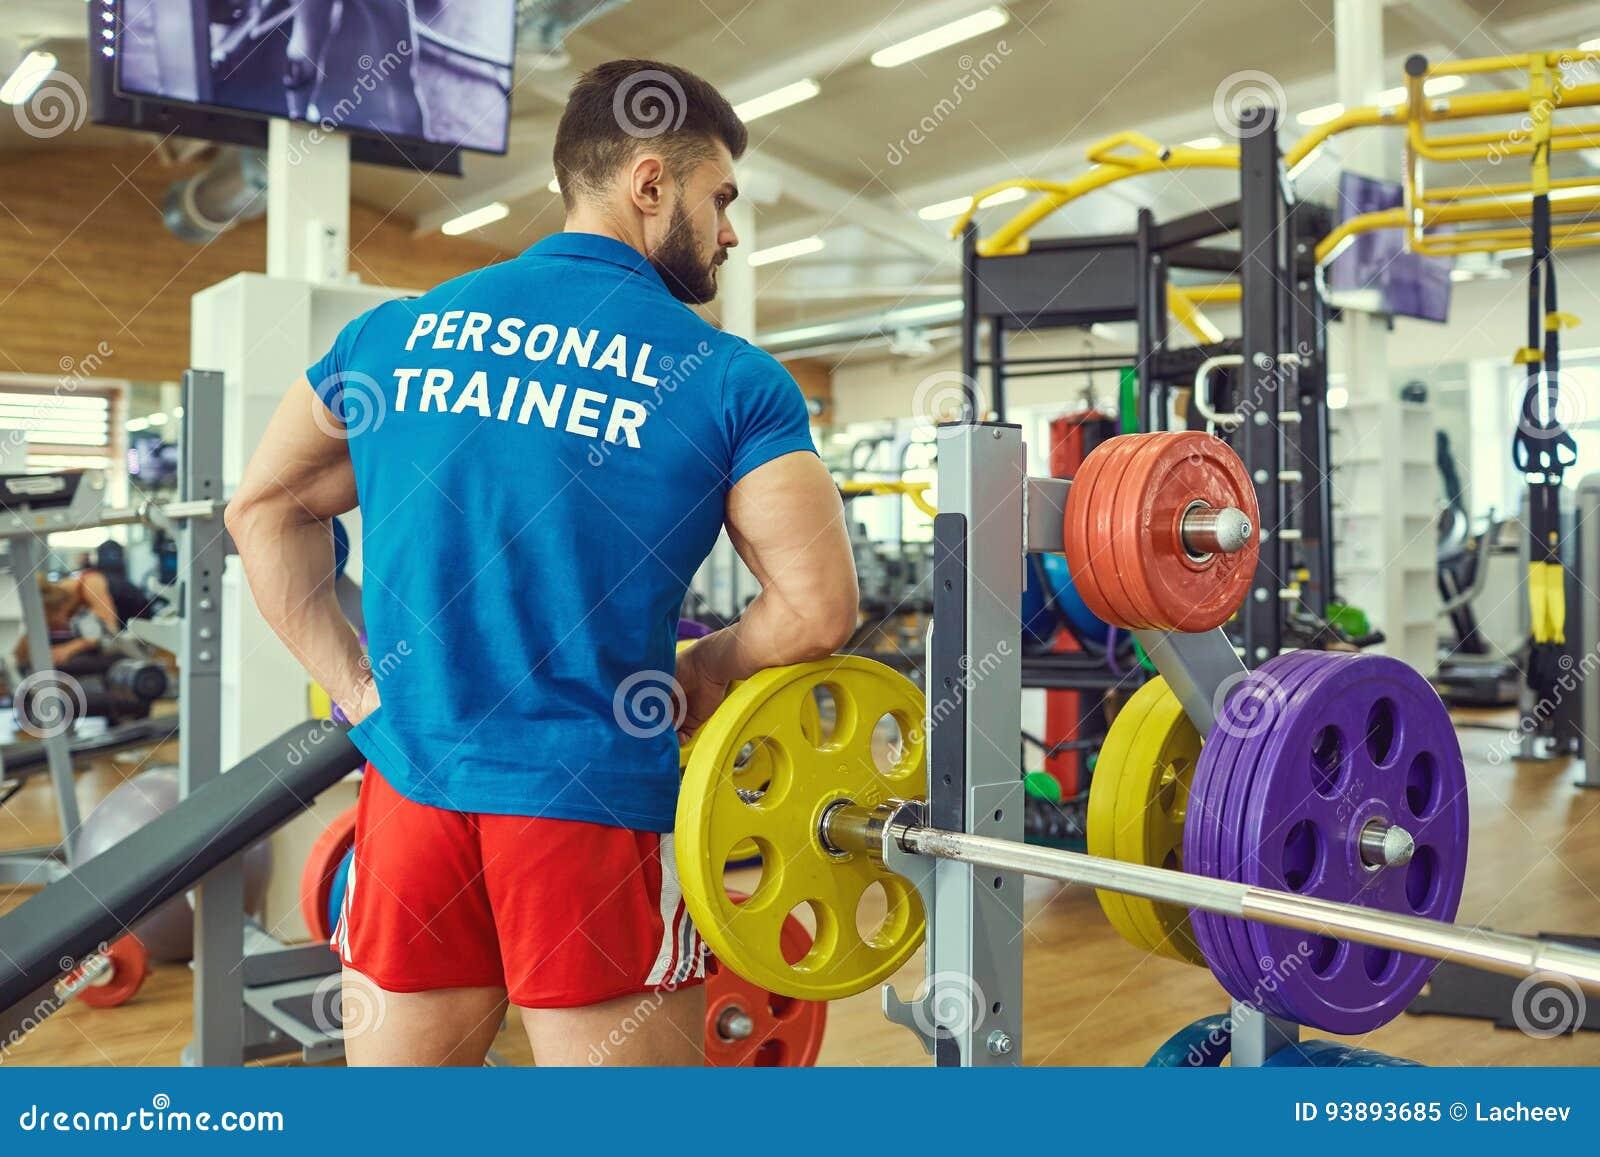 Club Trainer